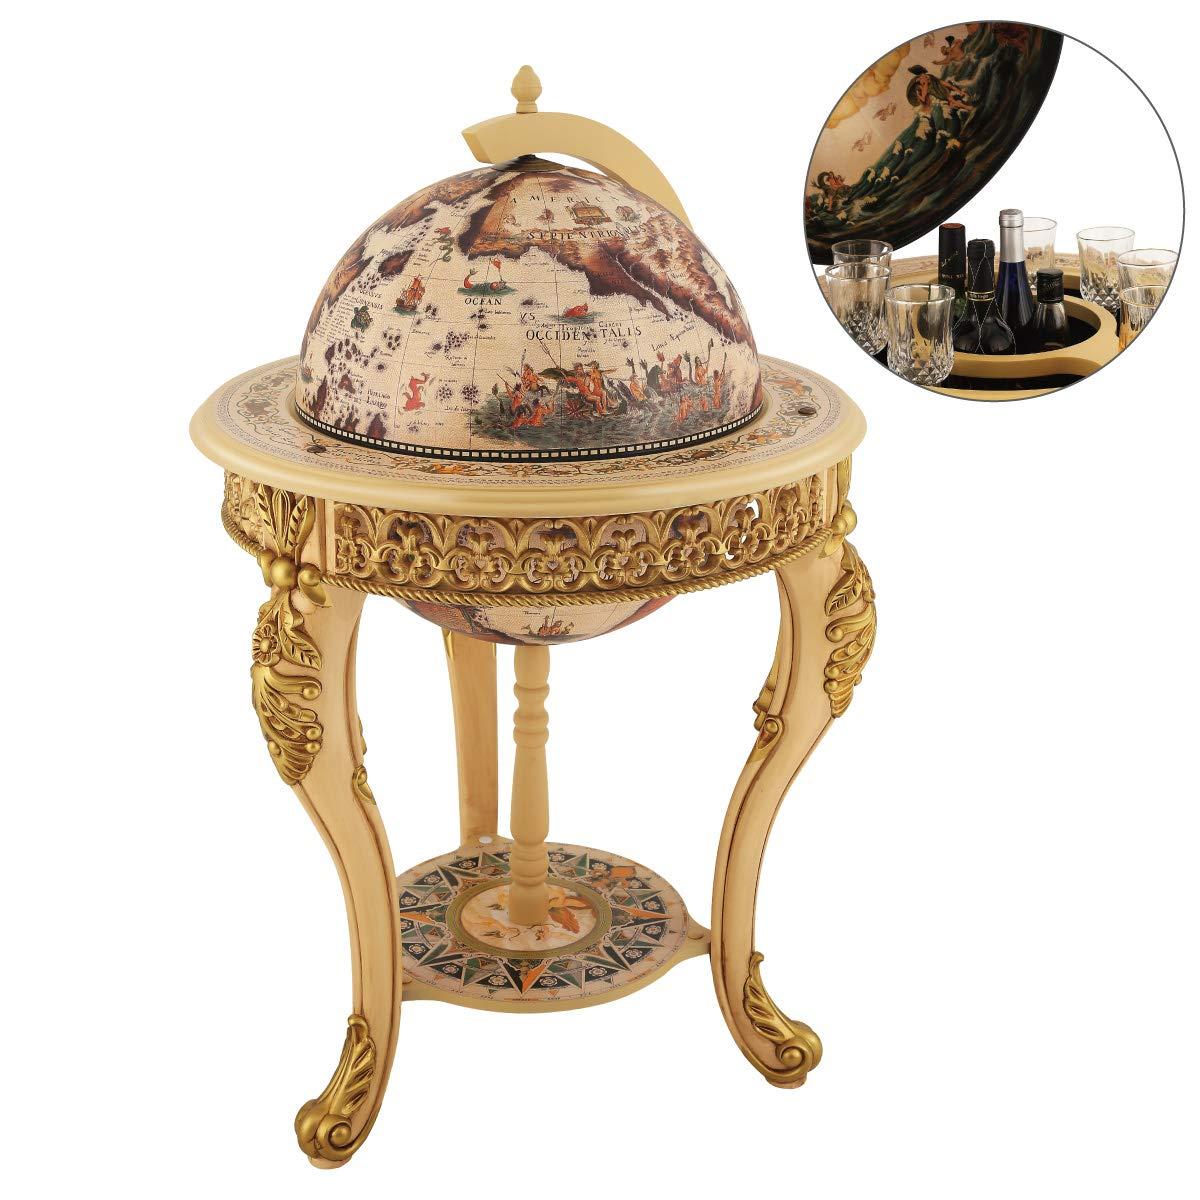 VIDAR Sixteenth-Century Italian Replica Old World Map Parchment Globe Bar Wine Holder 3 Legs in Engraved Golden Composite Plastic Finish by VIDAR